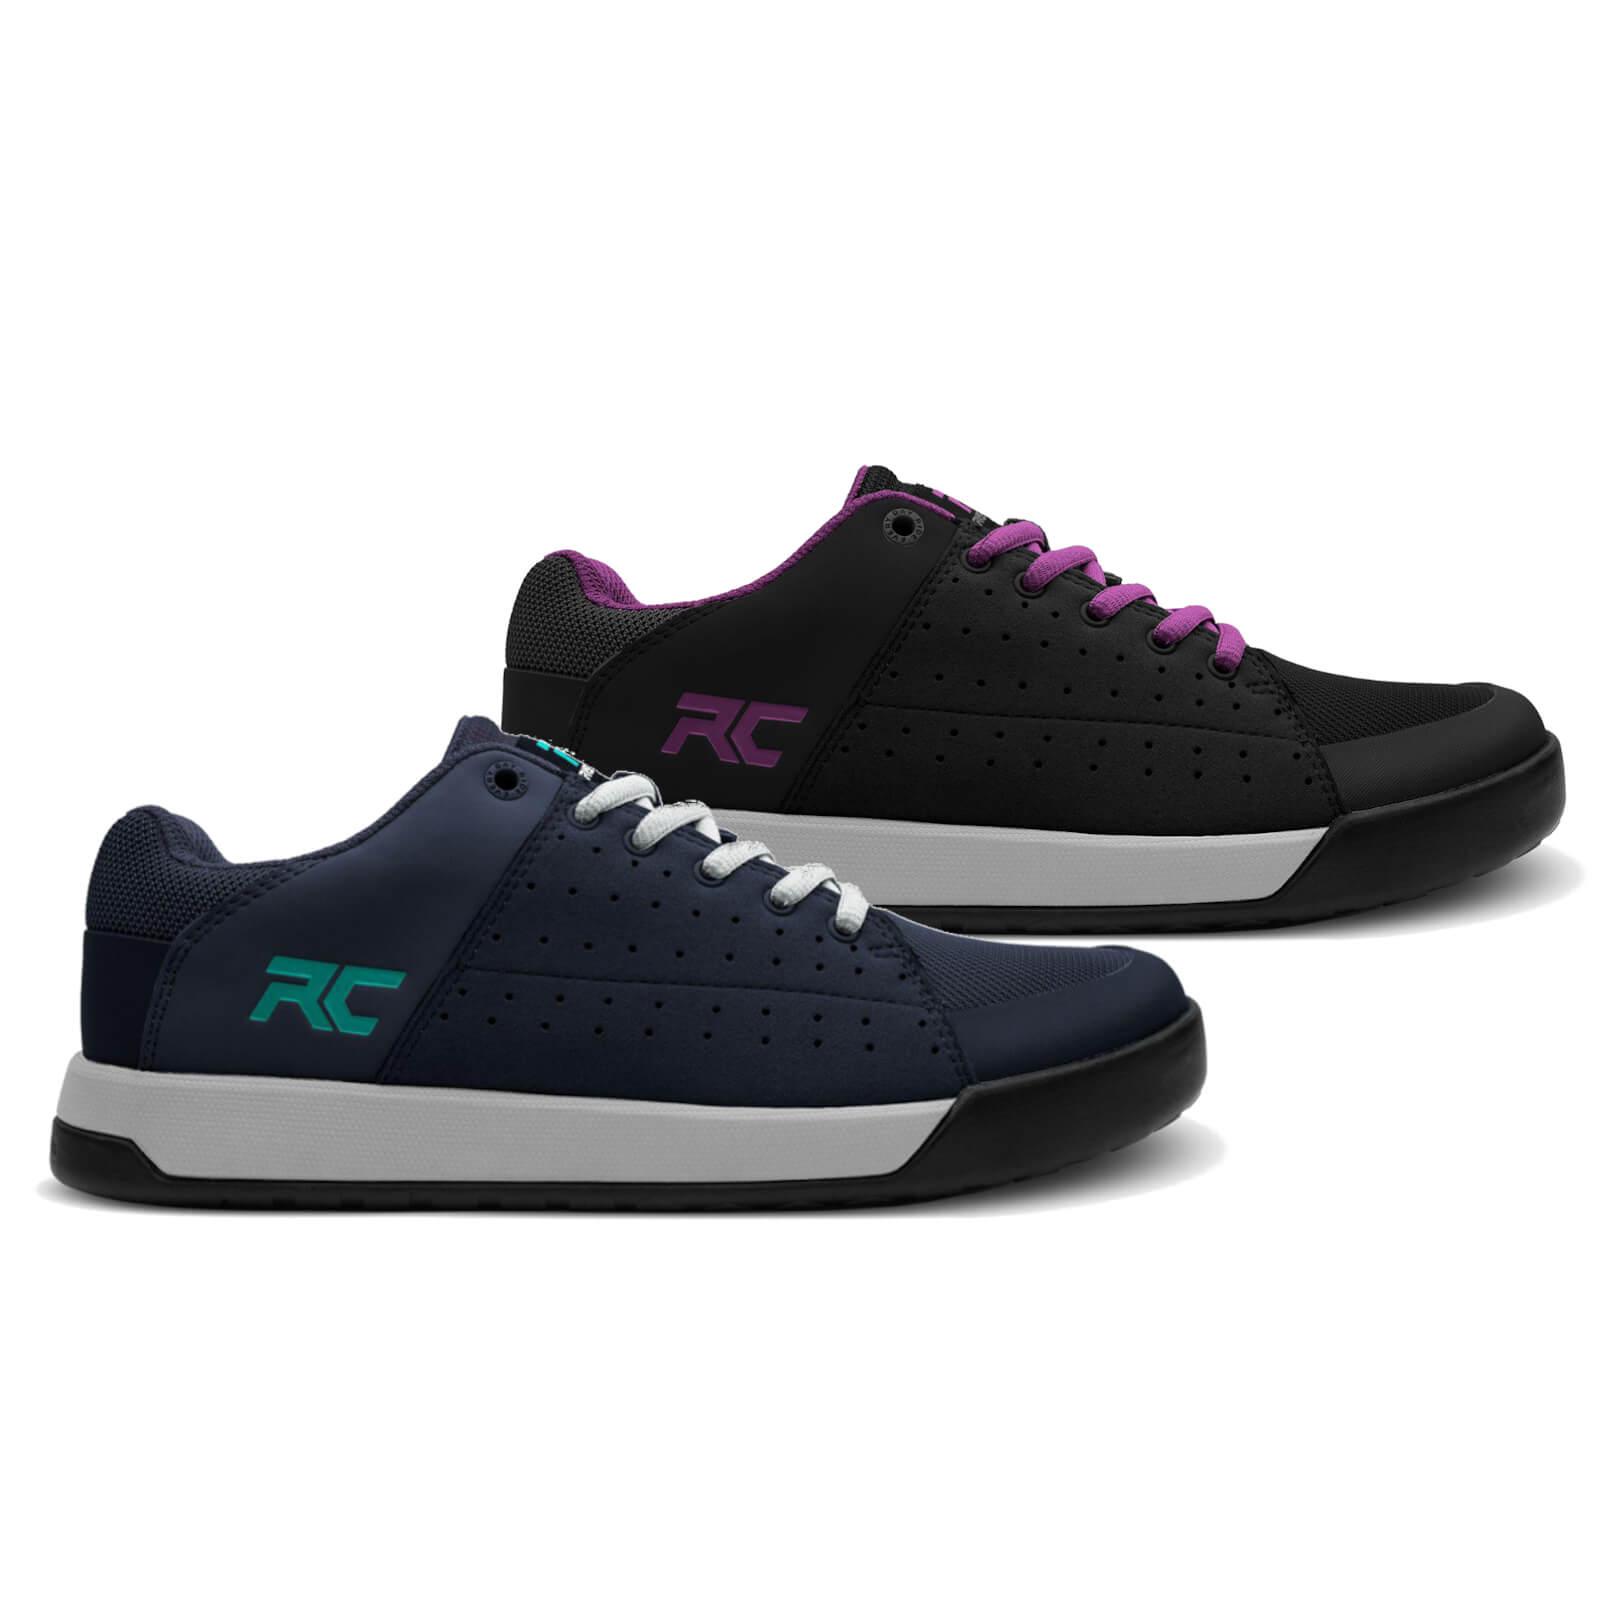 Ride Concepts Womens Livewire Flat Mtb Shoes - Uk 8/eu 41.5 - Black/purple